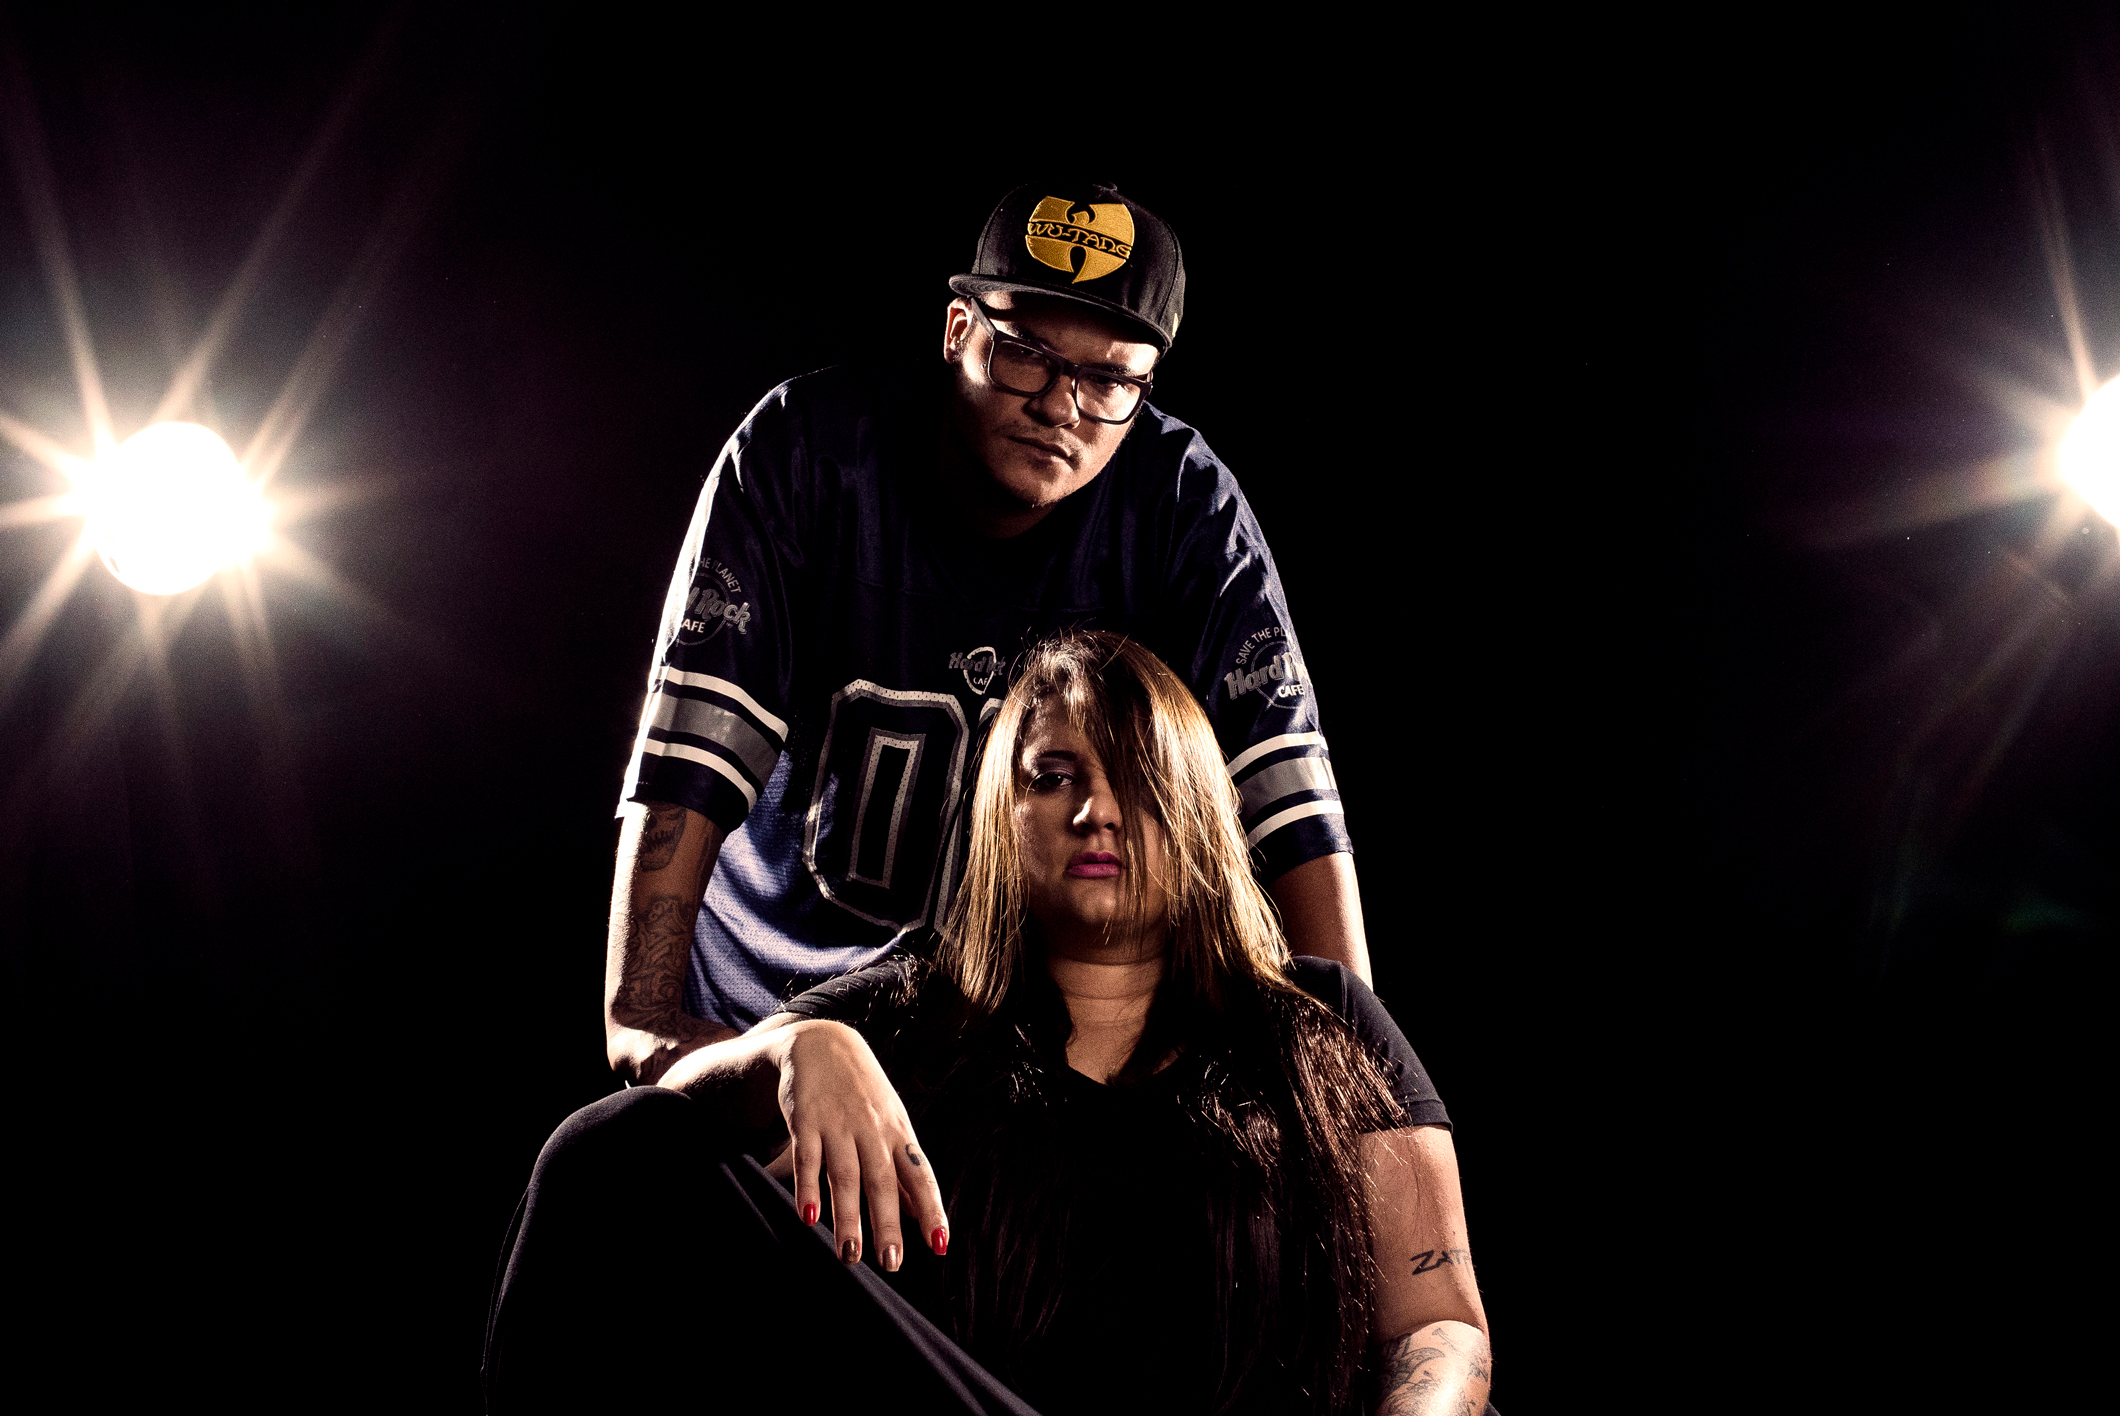 PREMIERE Com Diablo duo Sound Cloup estreia na Vibez Sounds